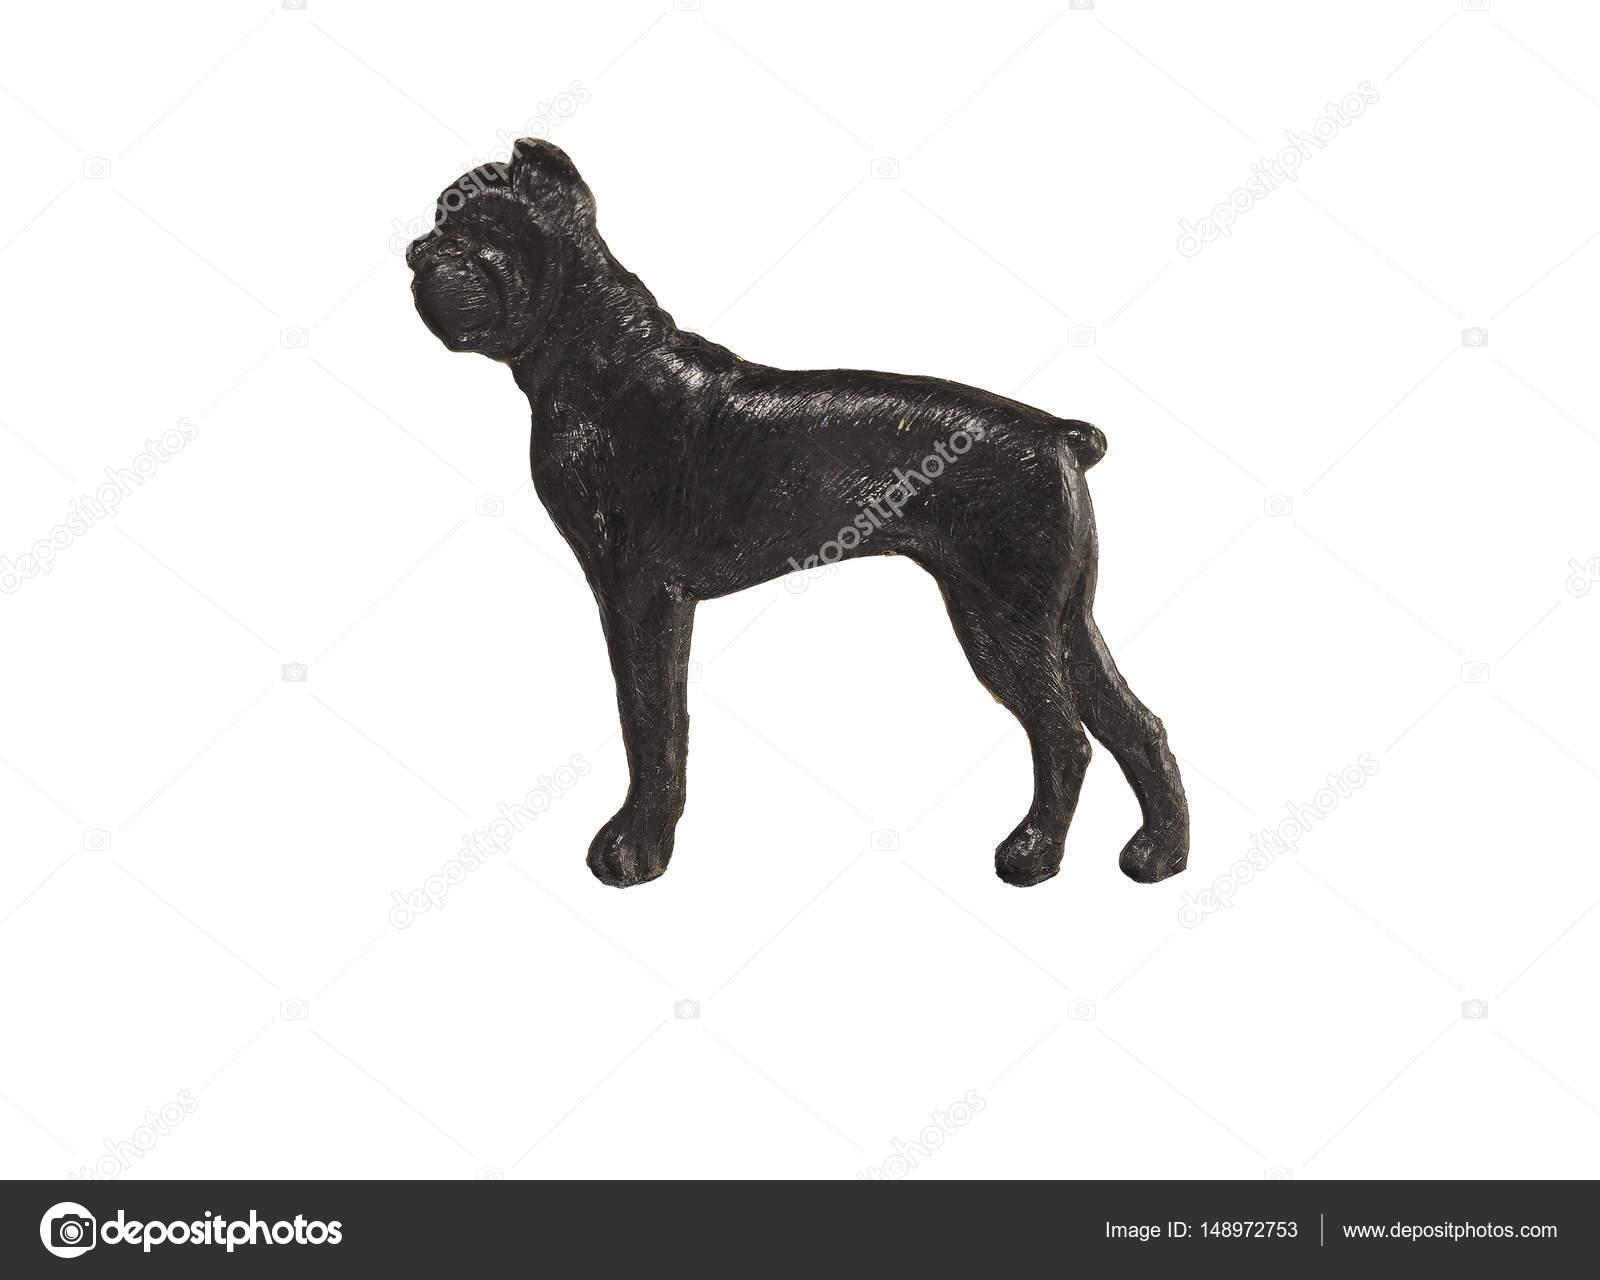 rencontres Staffordshire figurines